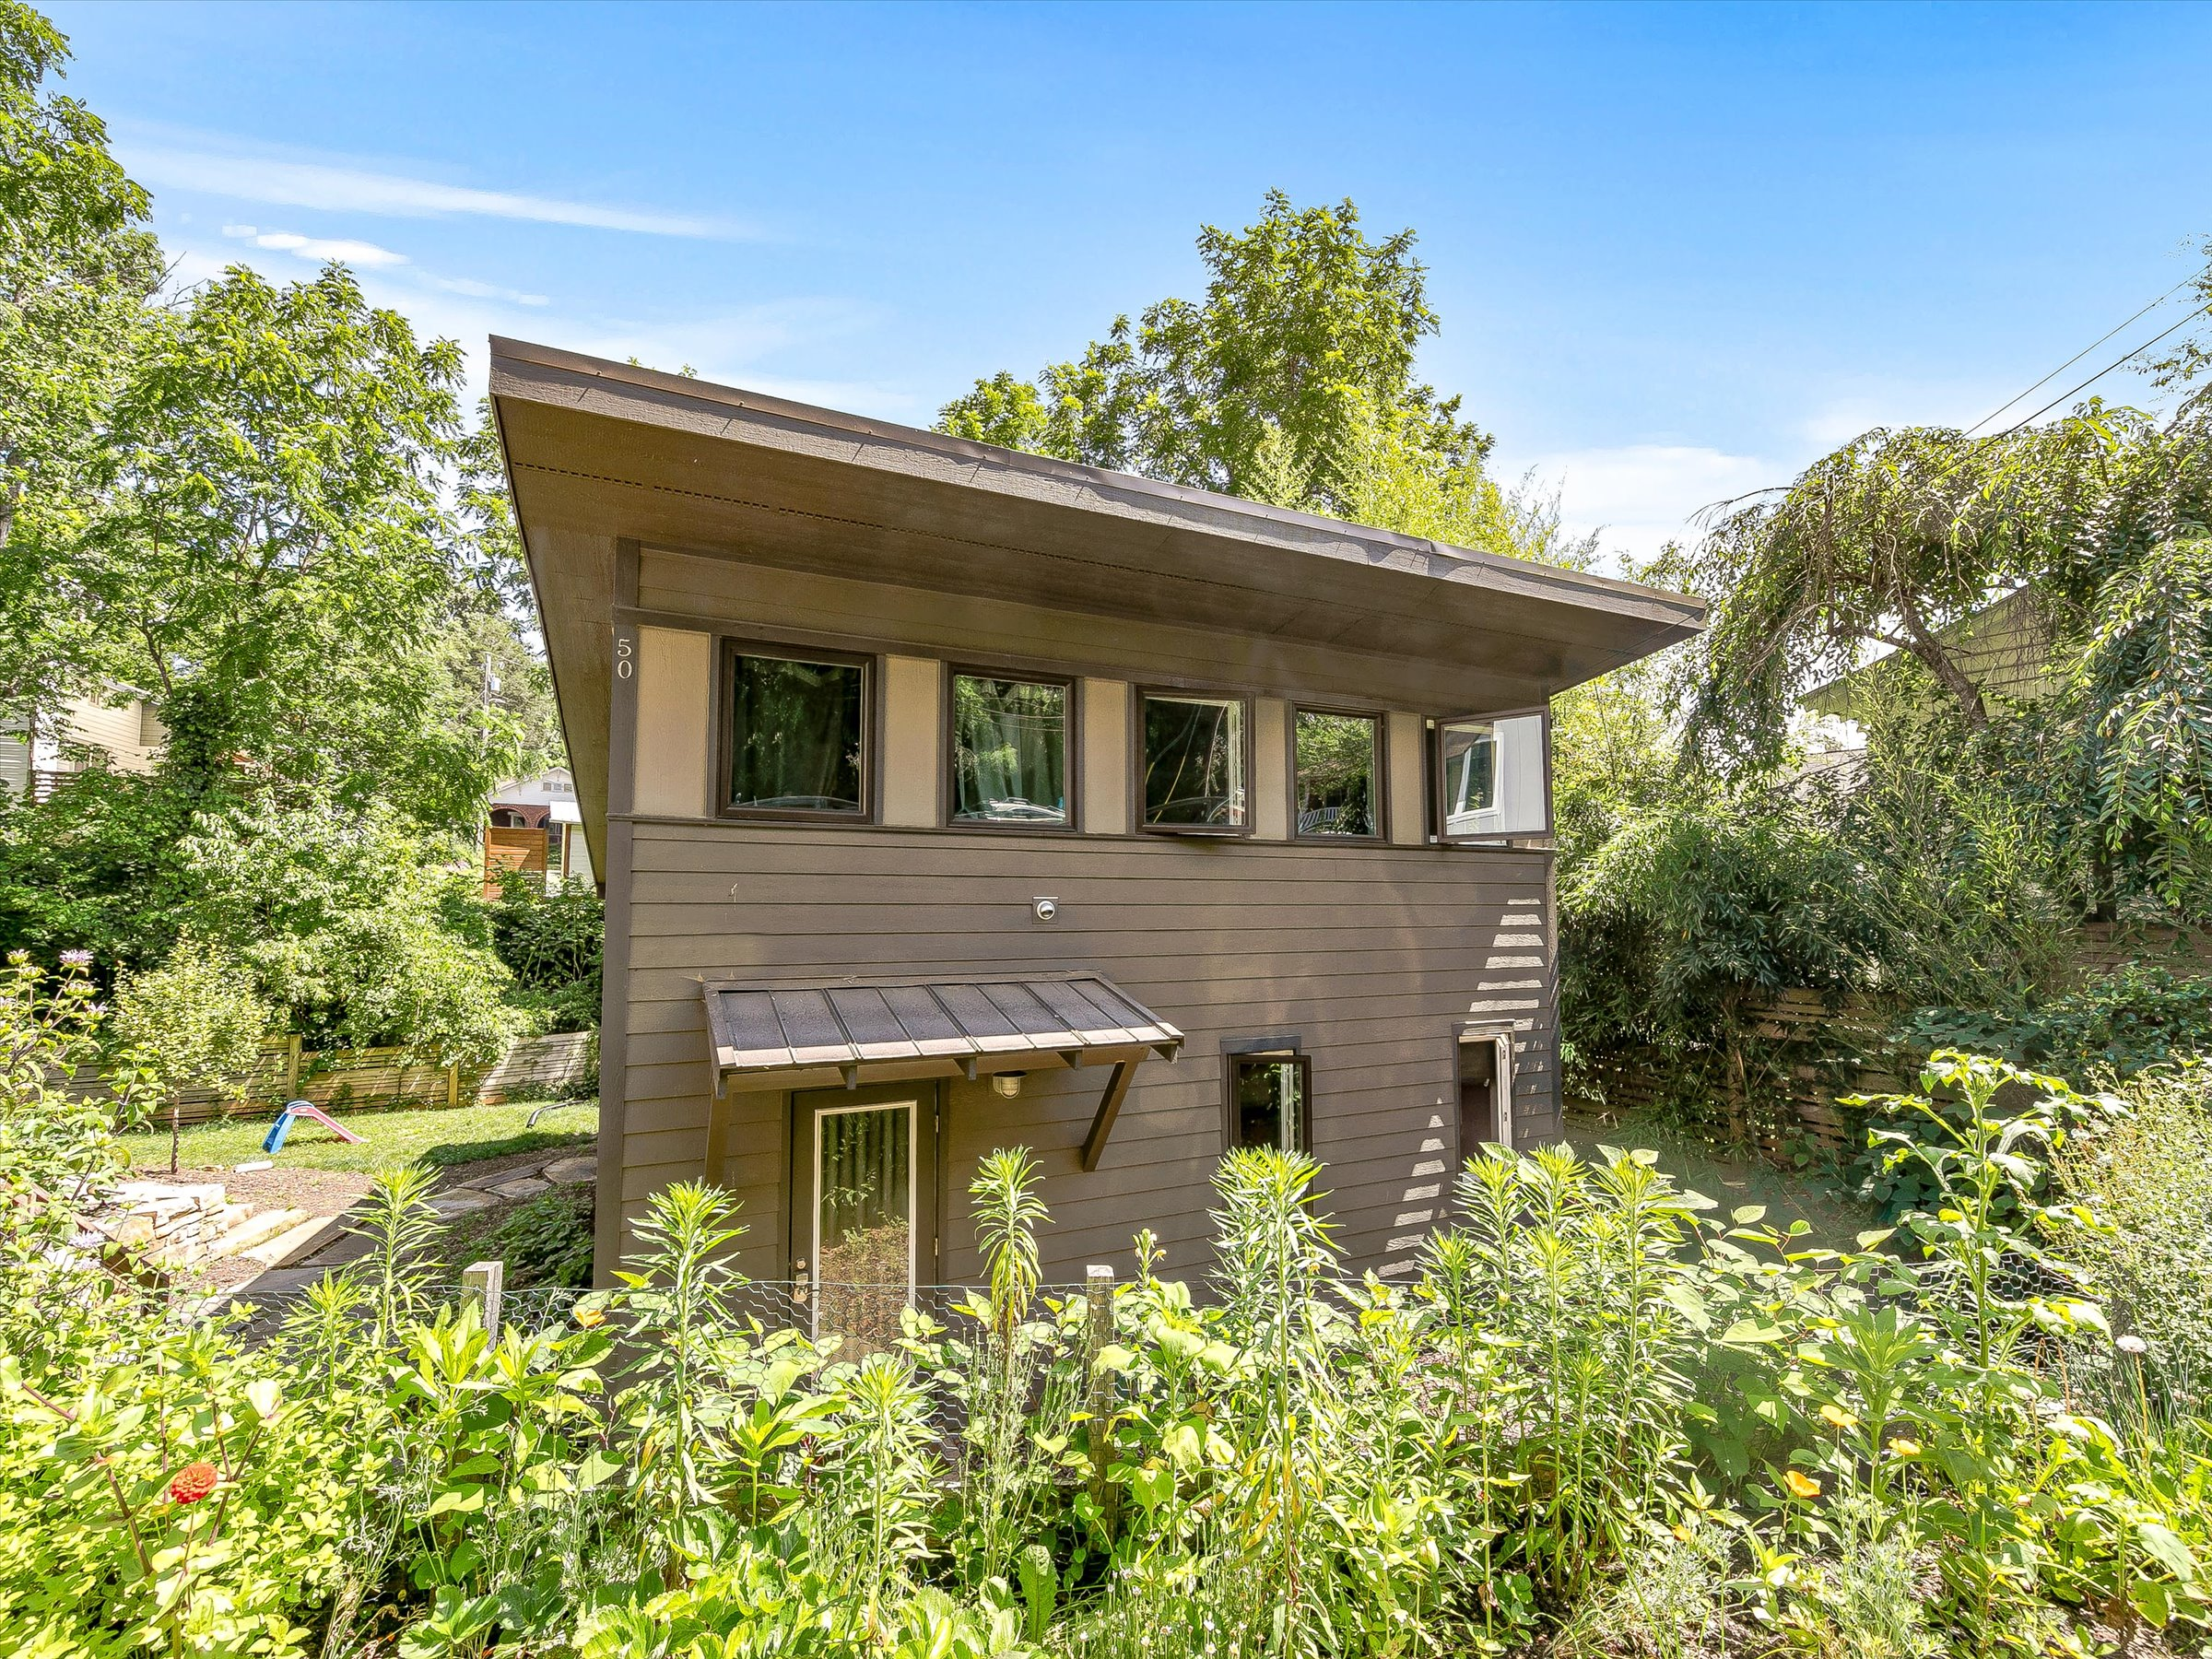 Green Built Home: Walkable + Modern in Urban West Asheville